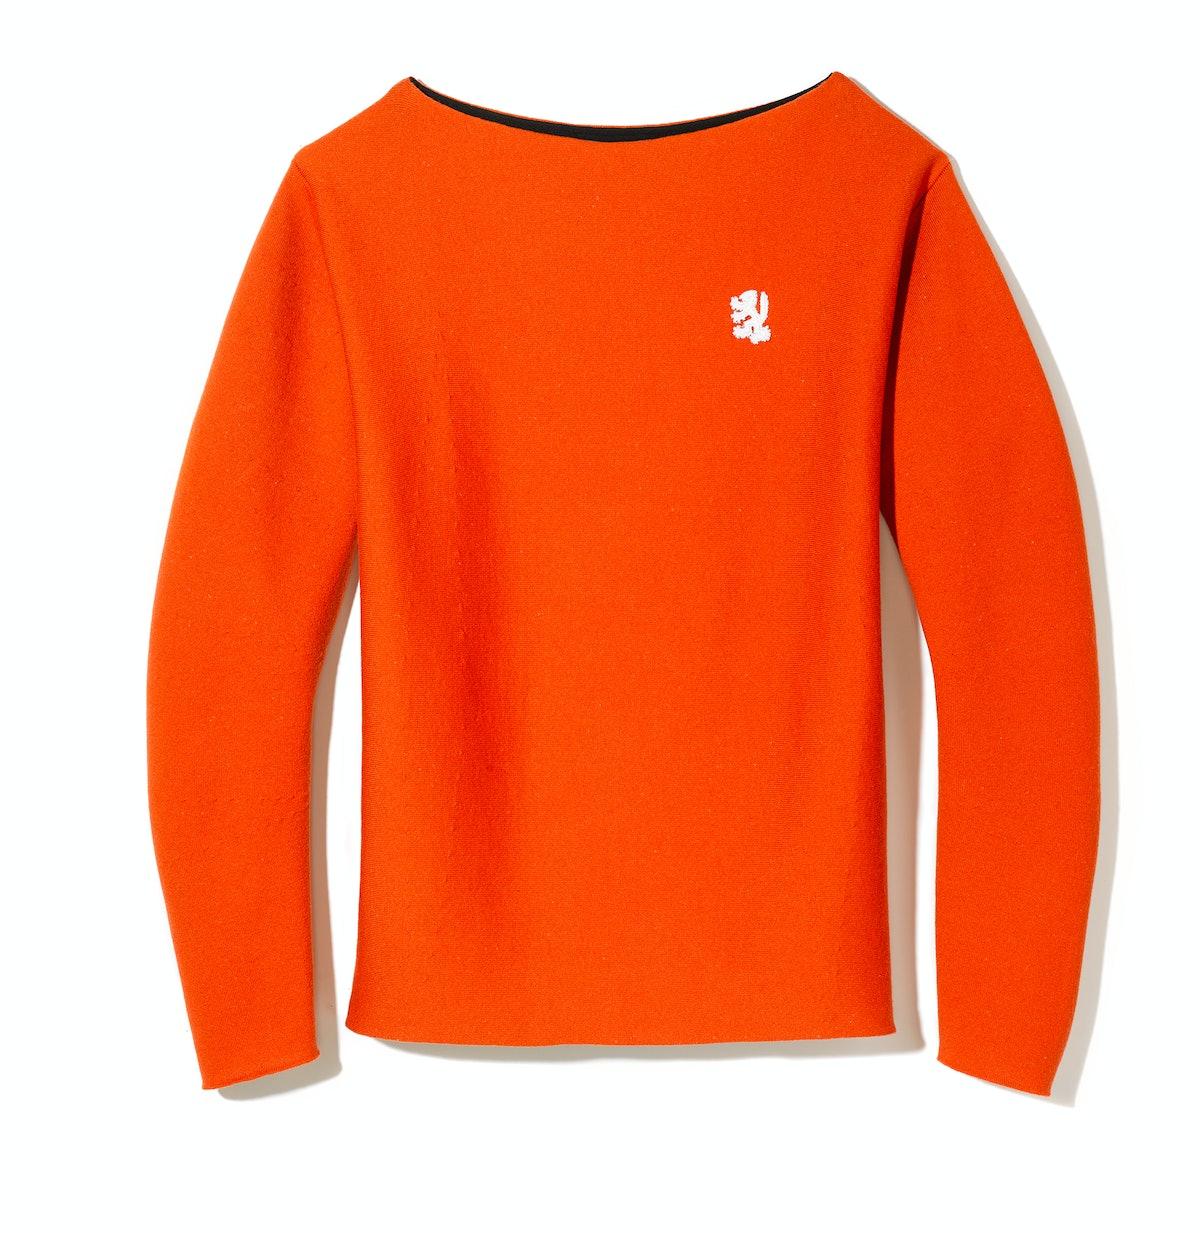 Pringle of Scotland sweater